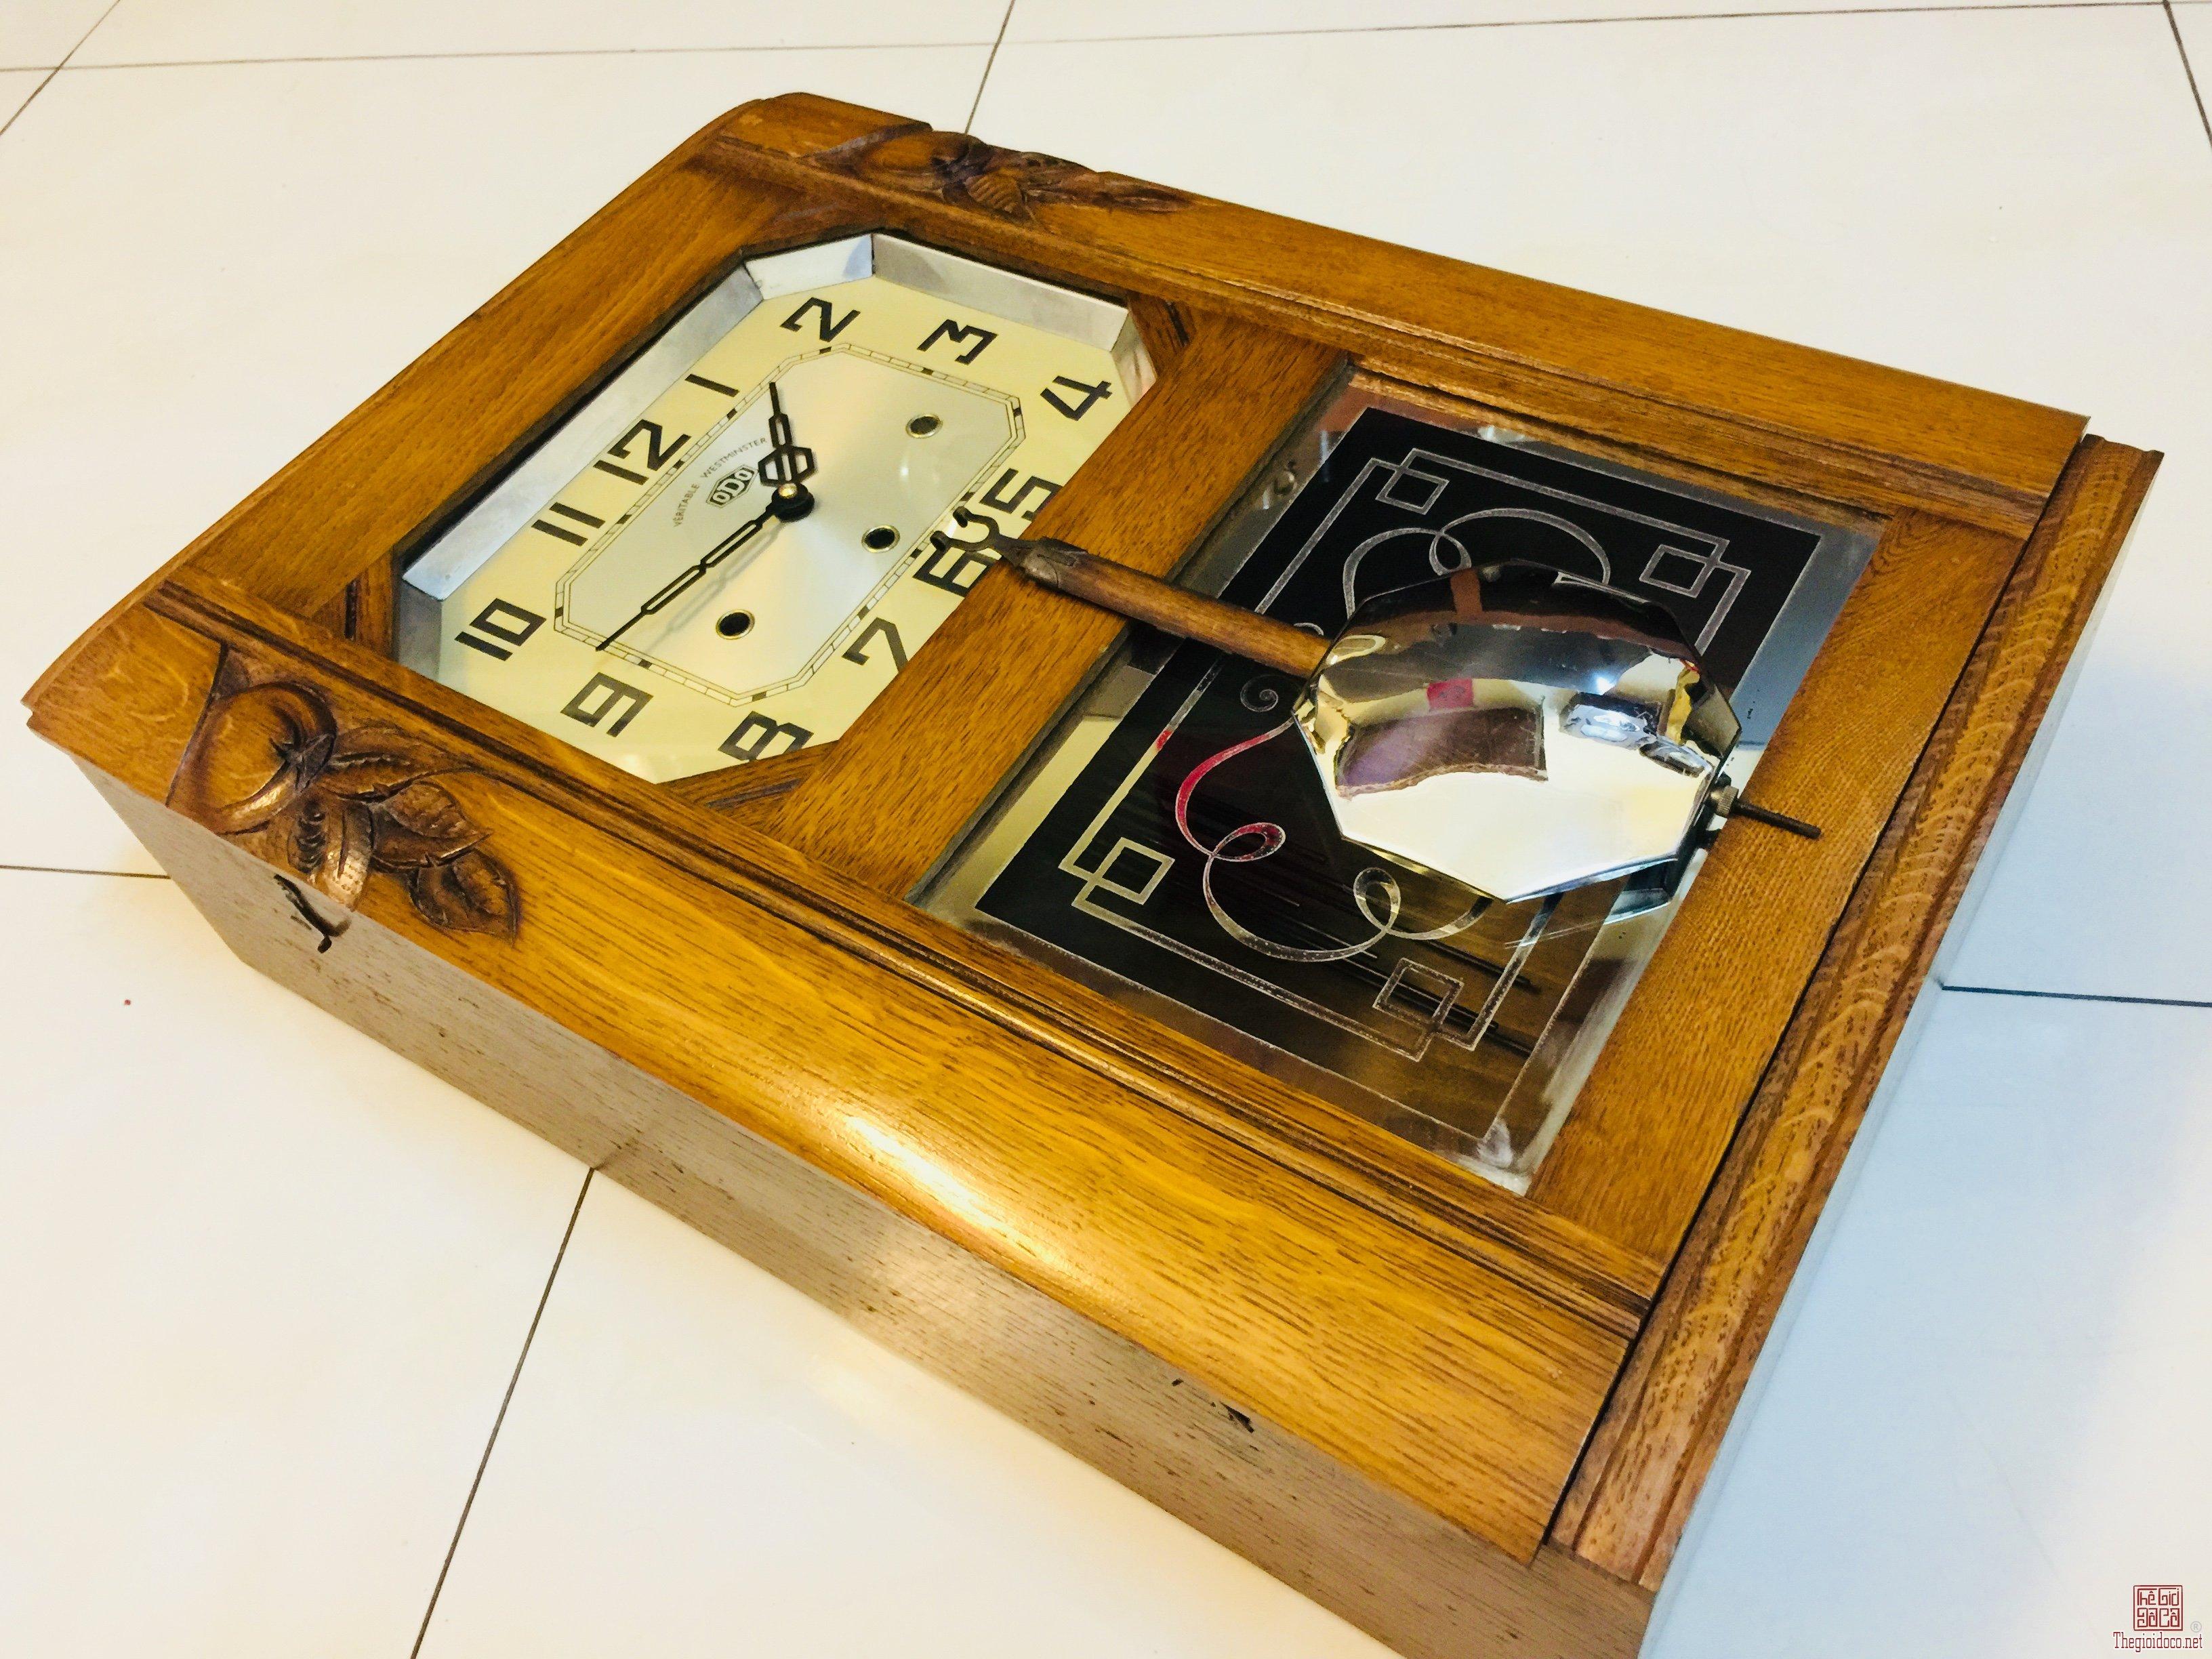 Đồng hồ Odo 54 Pháp rất đẹp, âm rất hay